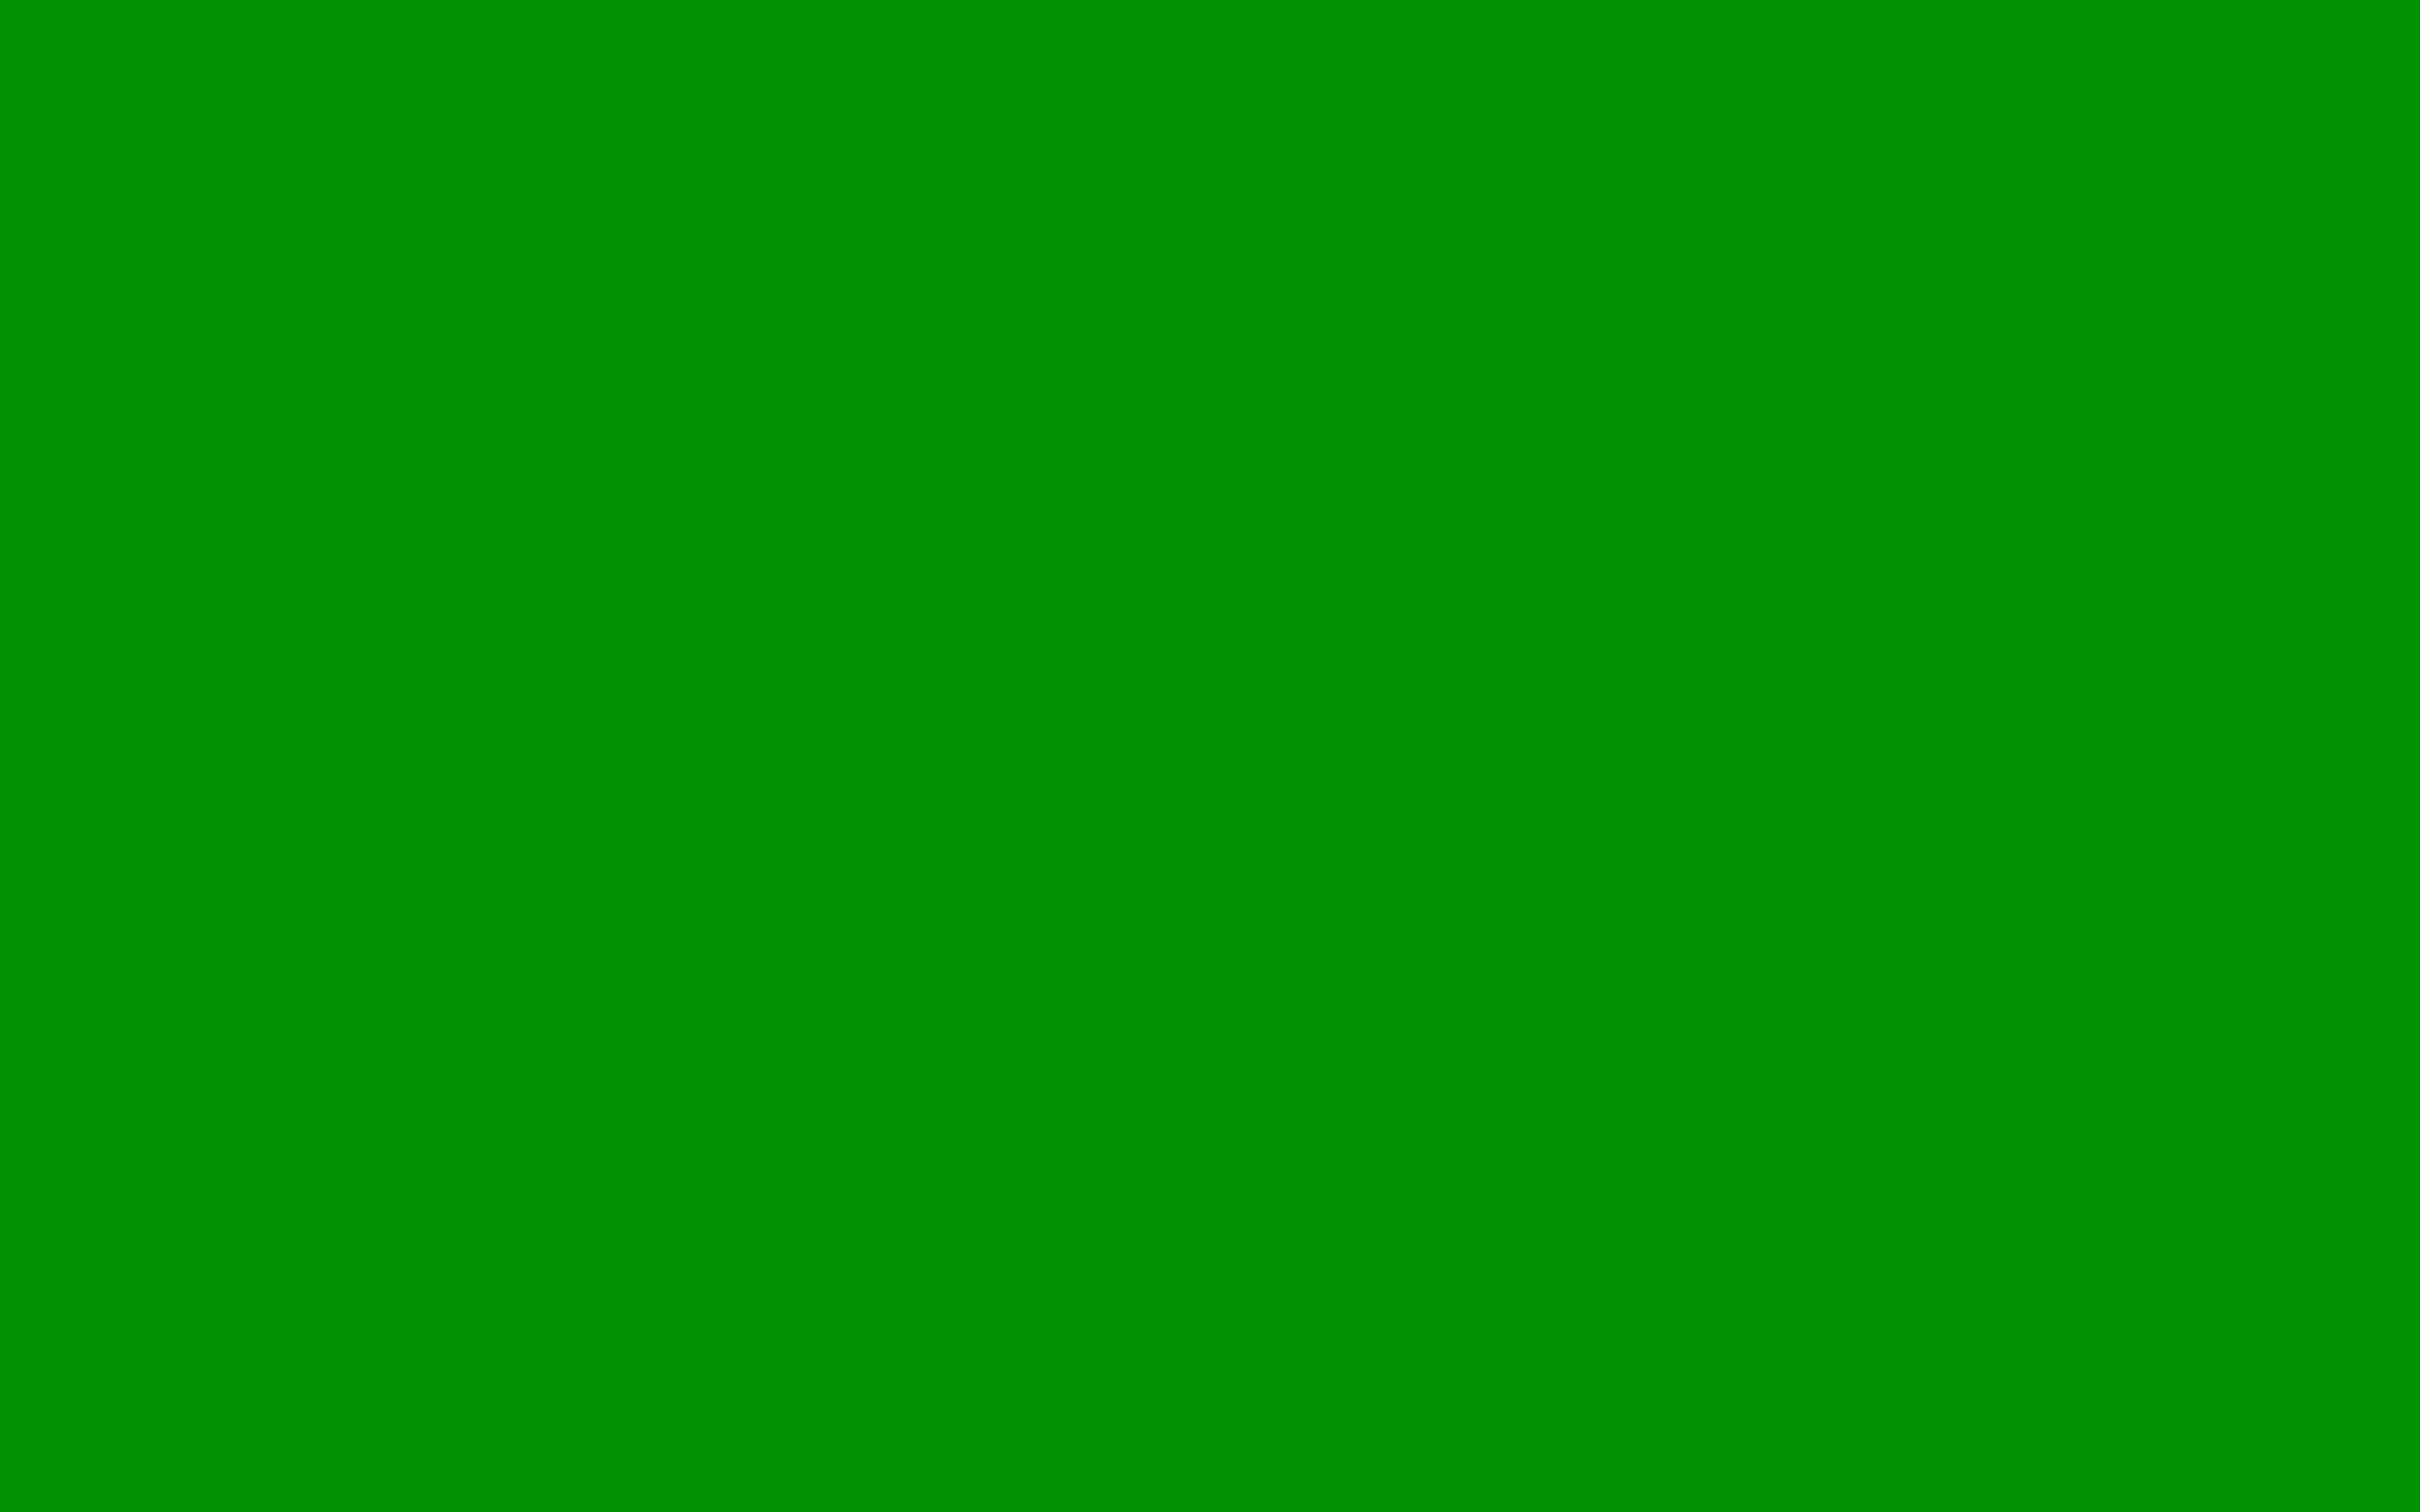 solid green wallpaper wallpapersafari. Black Bedroom Furniture Sets. Home Design Ideas